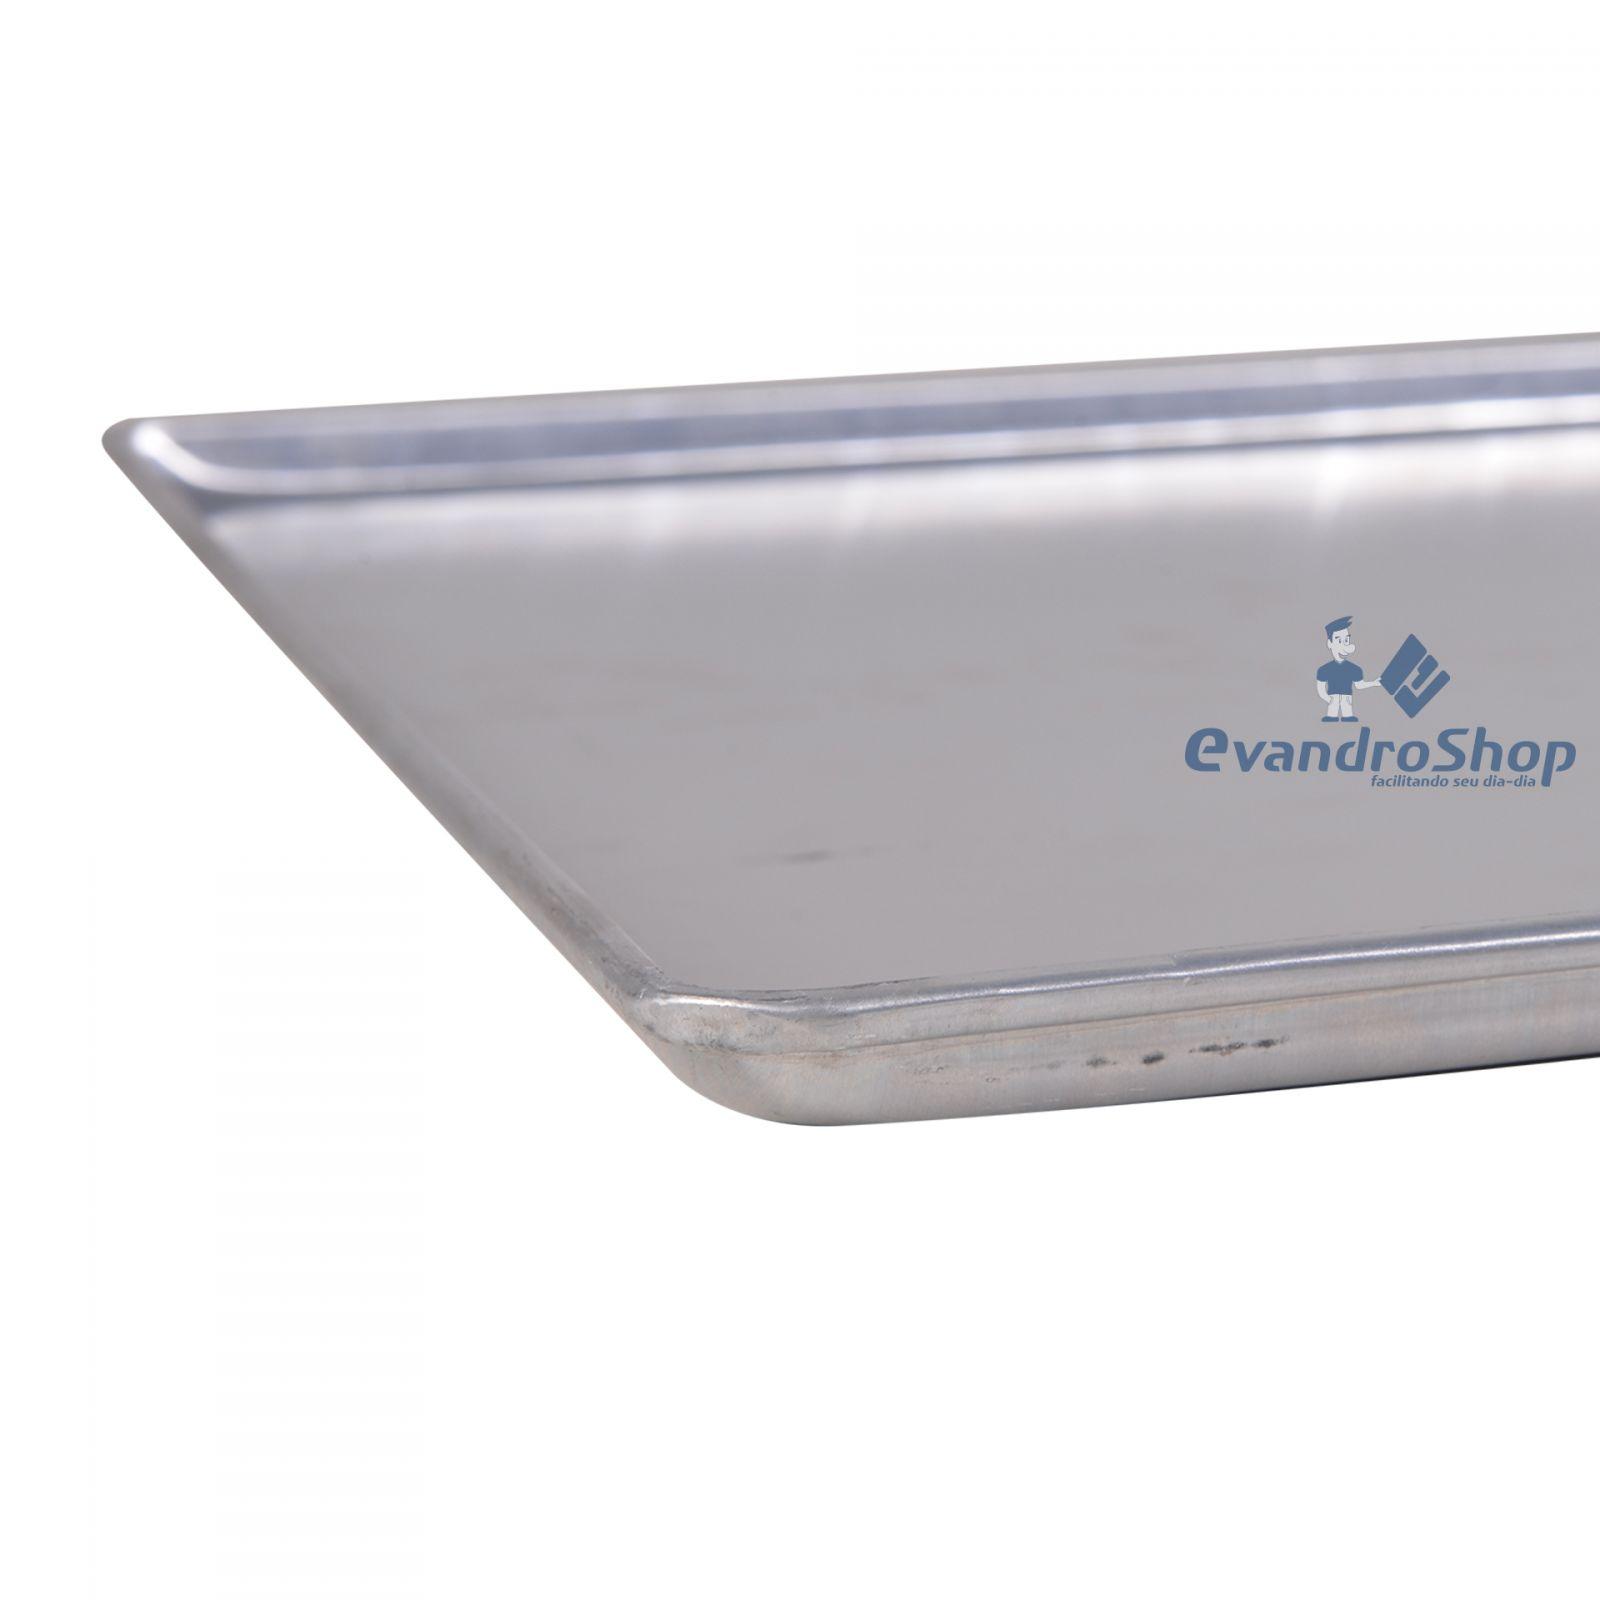 Assadeira De Aluminol Lisa 58X70X4 Alz04 - Cainco